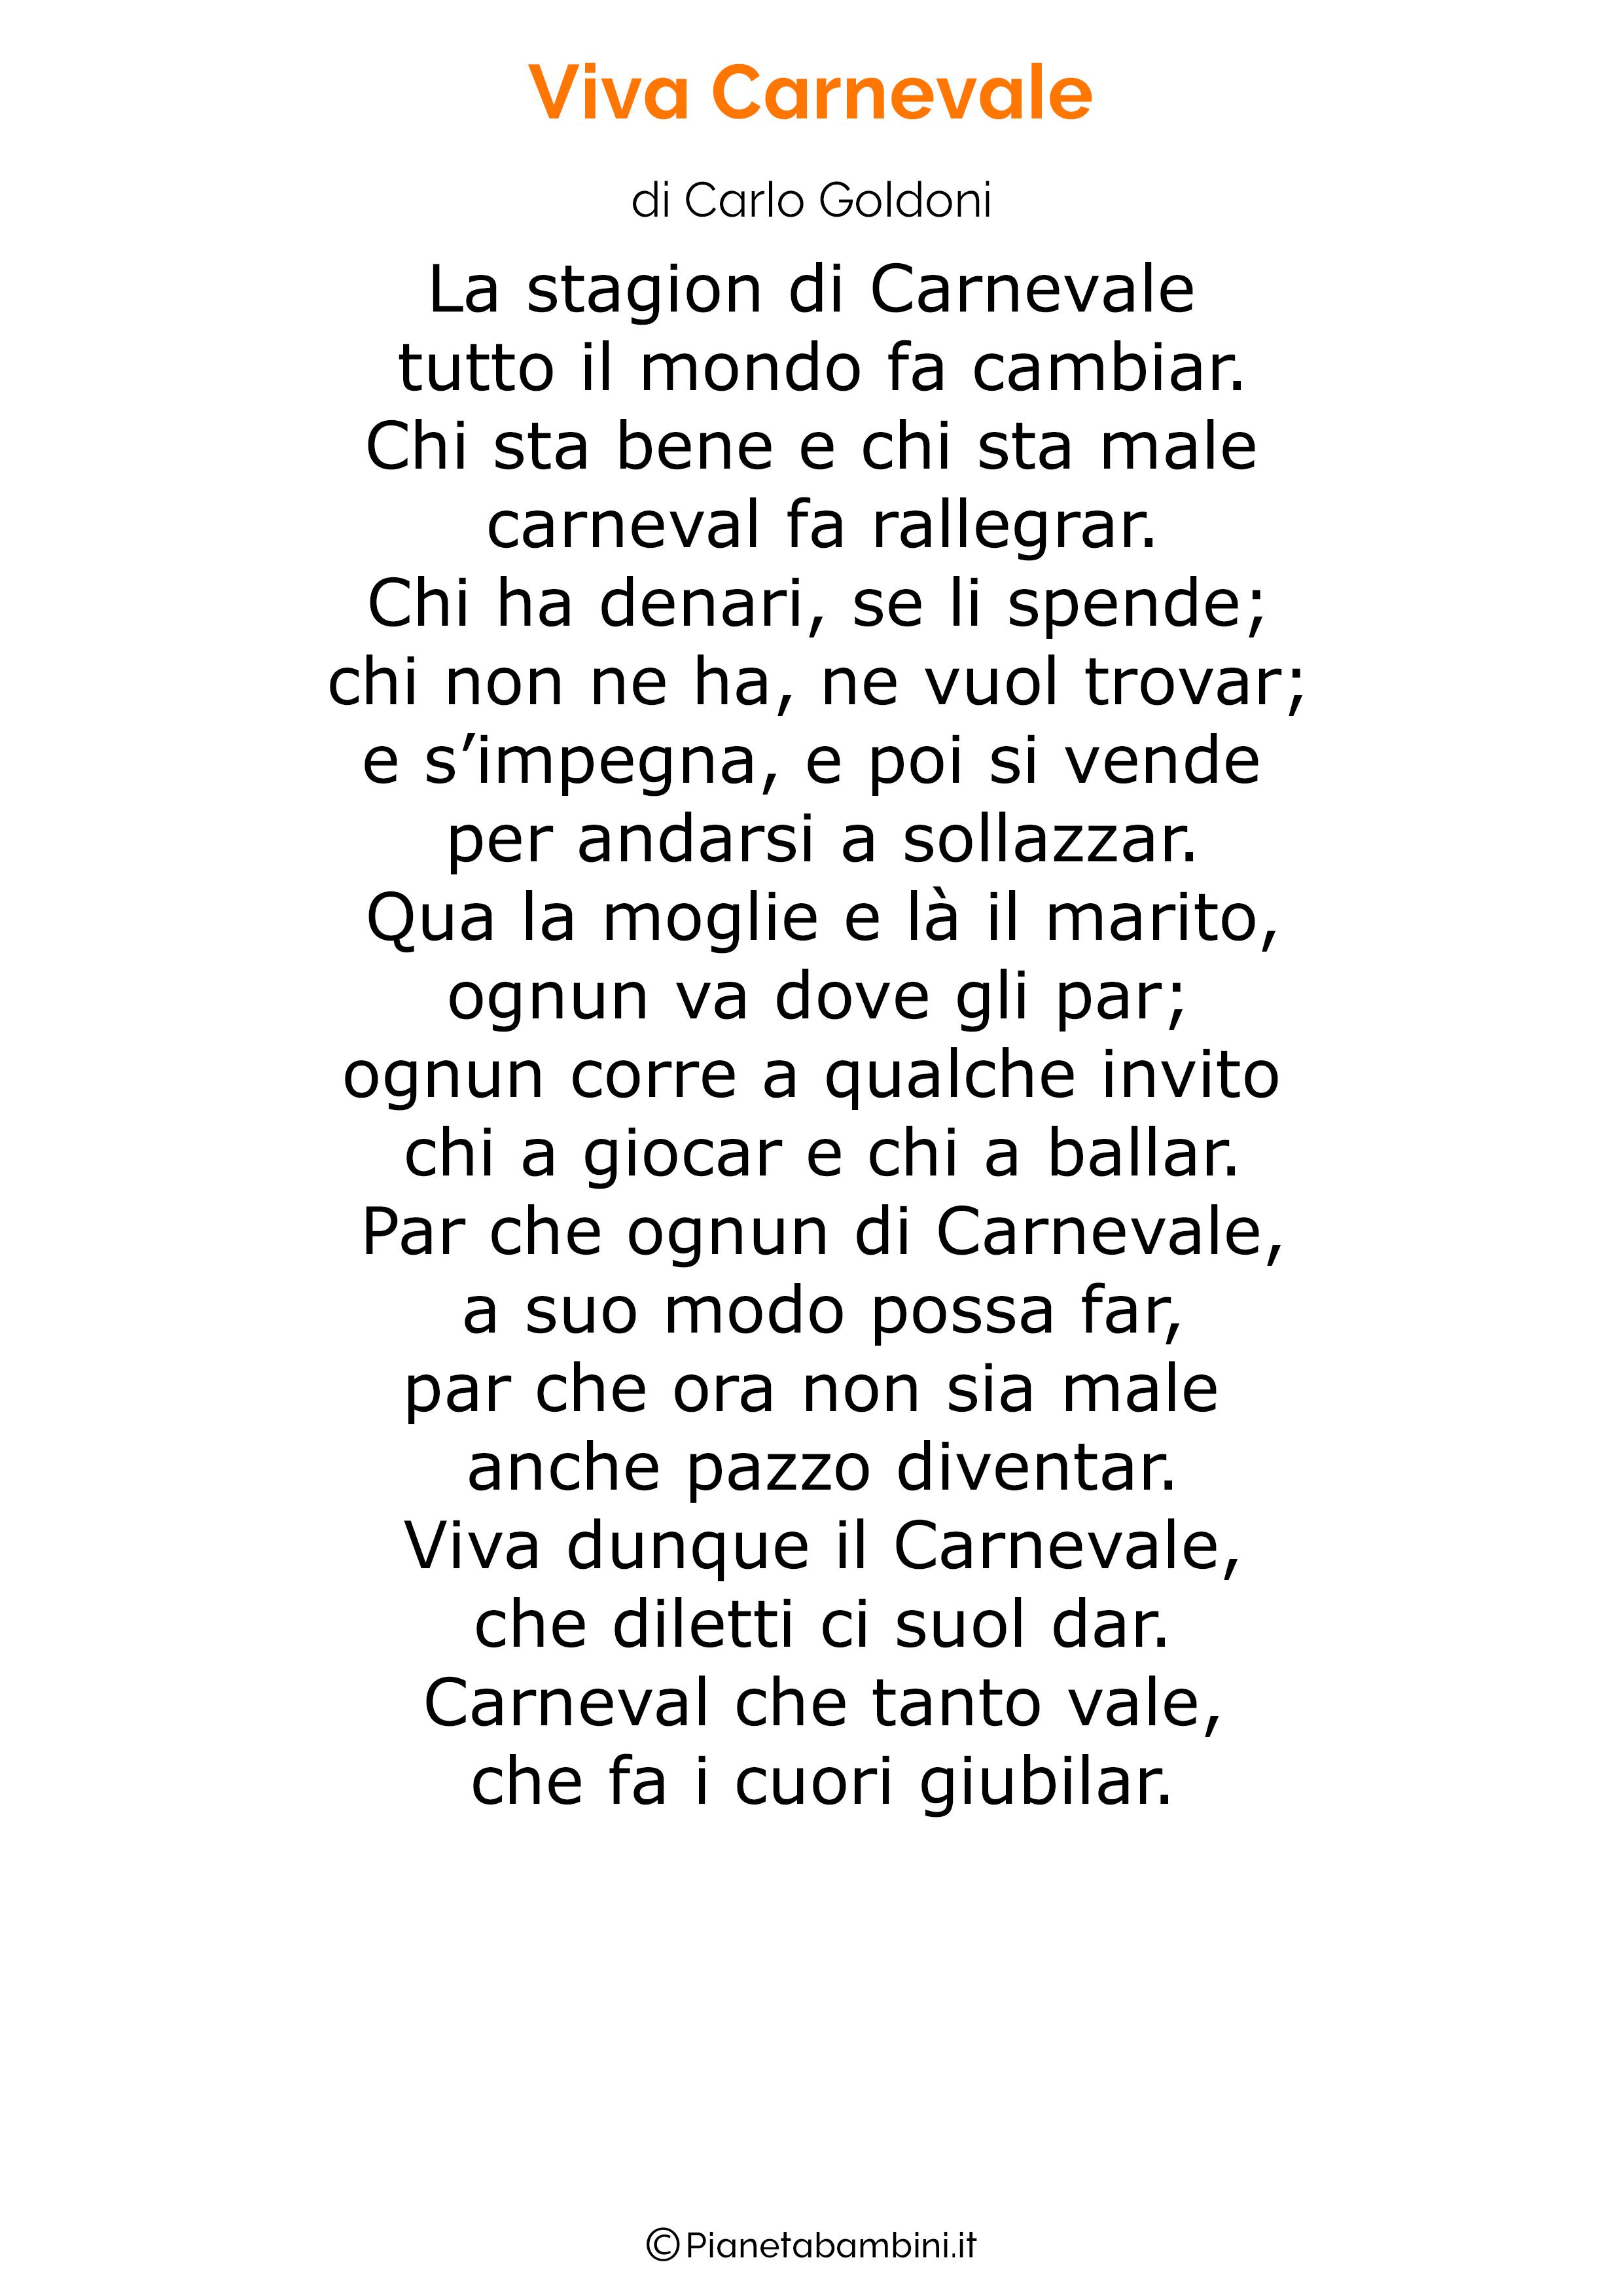 Poesie di Carnevale per bambini 18